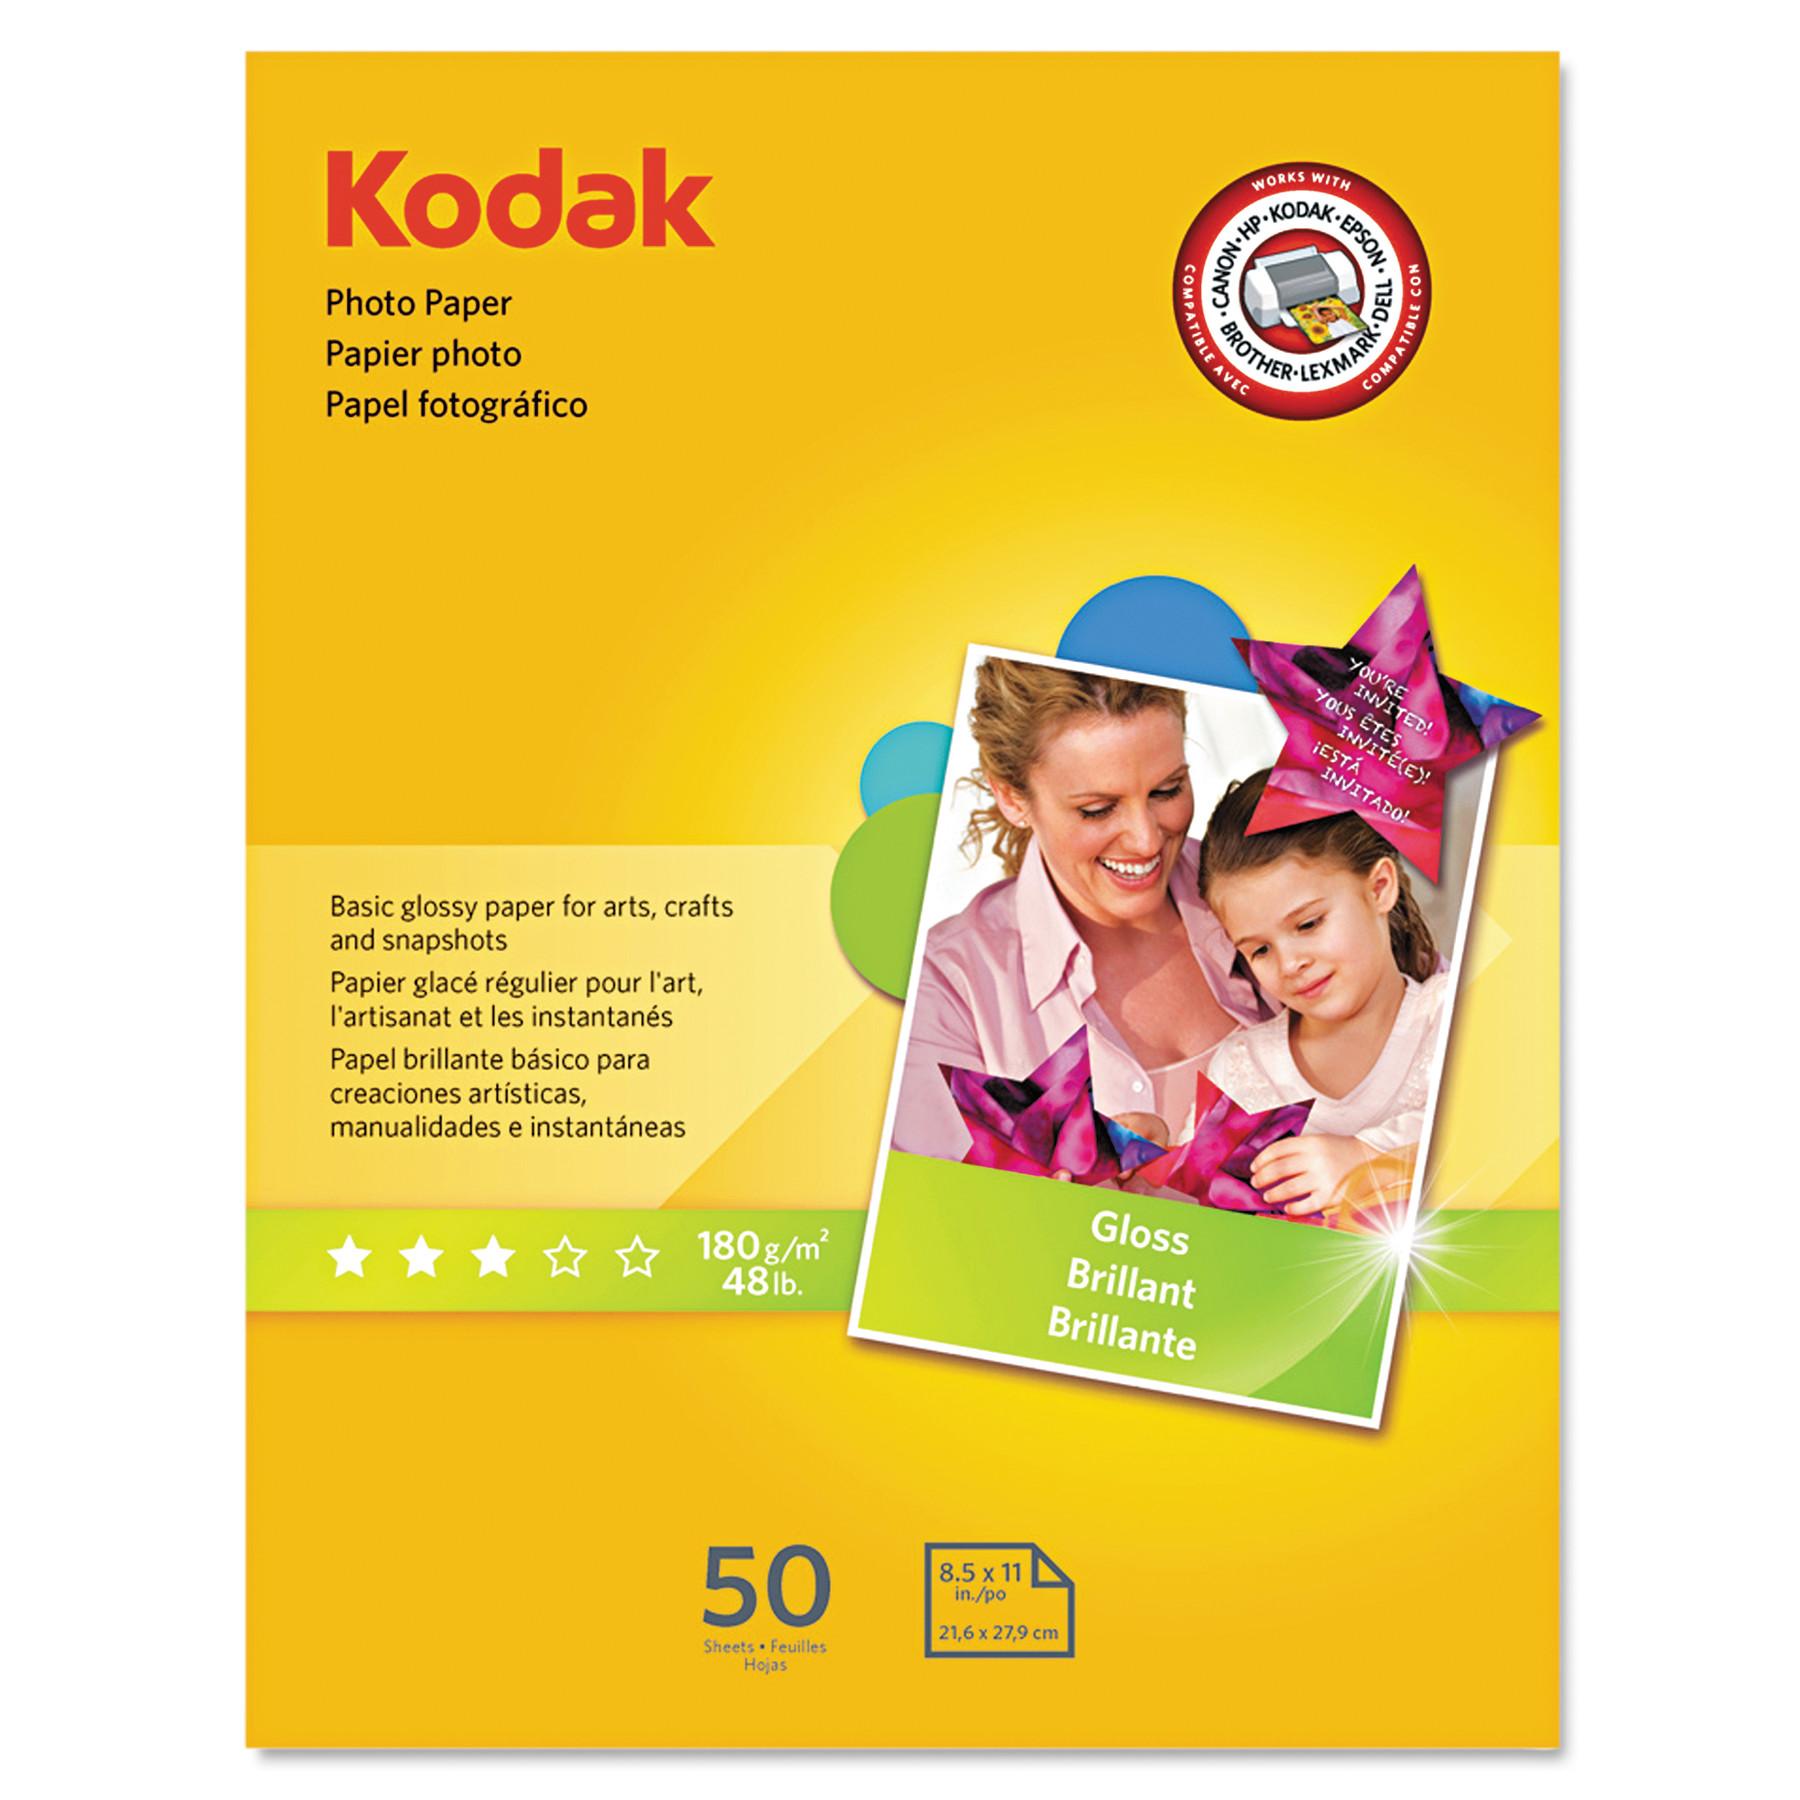 Kodak Photo Paper, 6.5 mil, Glossy, 8-1/2 x 11, 50 Sheets/Pack -KOD1213719